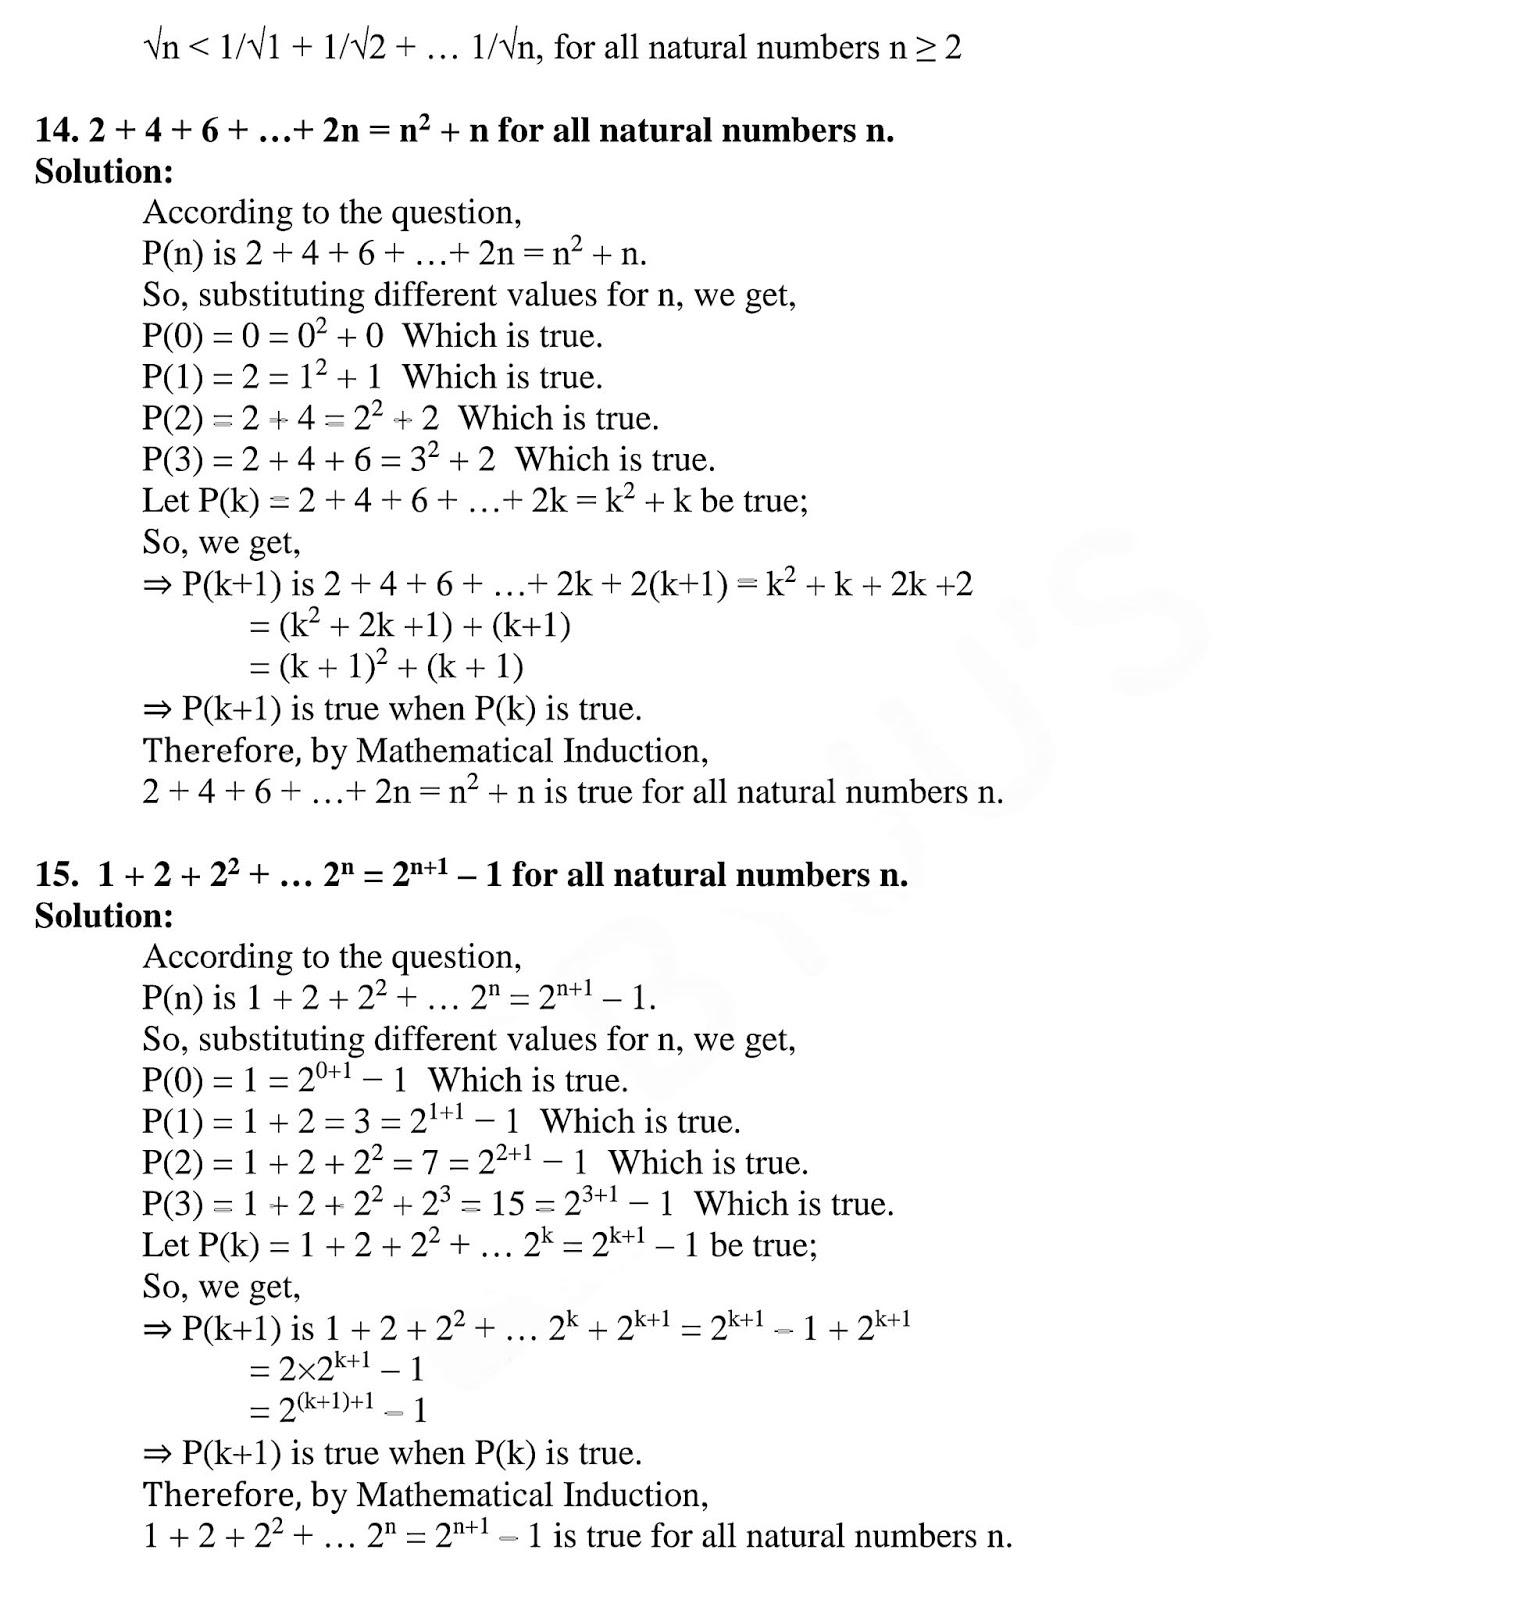 https://1.bp.blogspot.com/-Ldczje6Rhv0/X3cB58E6tzI/AAAAAAAAAK4/r_YxjvL_gwI0J0Gd27zNHDWrnuOaQSxWgCLcBGAsYHQ/w700/PicsArt_10-02-04.02.08.jpg   Class 11 Maths Chapter 4 Principle of Mathematical Induction,  11th Maths book in hindi,11th Maths notes in hindi,cbse books for class  11,cbse books in hindi,cbse ncert books,class  11  Maths notes in hindi,class  11 hindi ncert solutions, Maths 2020, Maths 2021, Maths 2022, Maths book class  11, Maths book in hindi, Maths class  11 in hindi, Maths notes for class  11 up board in hindi,ncert all books,ncert app in hindi,ncert book solution,ncert books class 10,ncert books class  11,ncert books for class 7,ncert books for upsc in hindi,ncert books in hindi class 10,ncert books in hindi for class  11  Maths,ncert books in hindi for class 6,ncert books in hindi pdf,ncert class  11 hindi book,ncert english book,ncert  Maths book in hindi,ncert  Maths books in hindi pdf,ncert  Maths class  11,ncert in hindi,old ncert books in hindi,online ncert books in hindi,up board  11th,up board  11th syllabus,up board class 10 hindi book,up board class  11 books,up board class  11 new syllabus,up Board  Maths 2020,up Board  Maths 2021,up Board  Maths 2022,up Board  Maths 2023,up board intermediate  Maths syllabus,up board intermediate syllabus 2021,Up board Master 2021,up board model paper 2021,up board model paper all subject,up board new syllabus of class 11th Maths,up board paper 2021,Up board syllabus 2021,UP board syllabus 2022,   11 वीं मैथ्स पुस्तक हिंदी में,  11 वीं मैथ्स नोट्स हिंदी में, कक्षा  11 के लिए सीबीएससी पुस्तकें, हिंदी में सीबीएससी पुस्तकें, सीबीएससी  पुस्तकें, कक्षा  11 मैथ्स नोट्स हिंदी में, कक्षा  11 हिंदी एनसीईआरटी समाधान, मैथ्स 2020, मैथ्स 2021, मैथ्स 2022, मैथ्स  बुक क्लास  11, मैथ्स बुक इन हिंदी, बायोलॉजी क्लास  11 हिंदी में, मैथ्स नोट्स इन क्लास  11 यूपी  बोर्ड इन हिंदी, एनसीईआरटी मैथ्स की किताब हिंदी में,  बोर्ड  11 वीं तक,  11 वीं तक की पाठ्यक्रम, बोर्ड कक्षा 10 की हिंदी पुस्तक  , बोर्ड की कक्षा  11 की किताबें, बोर